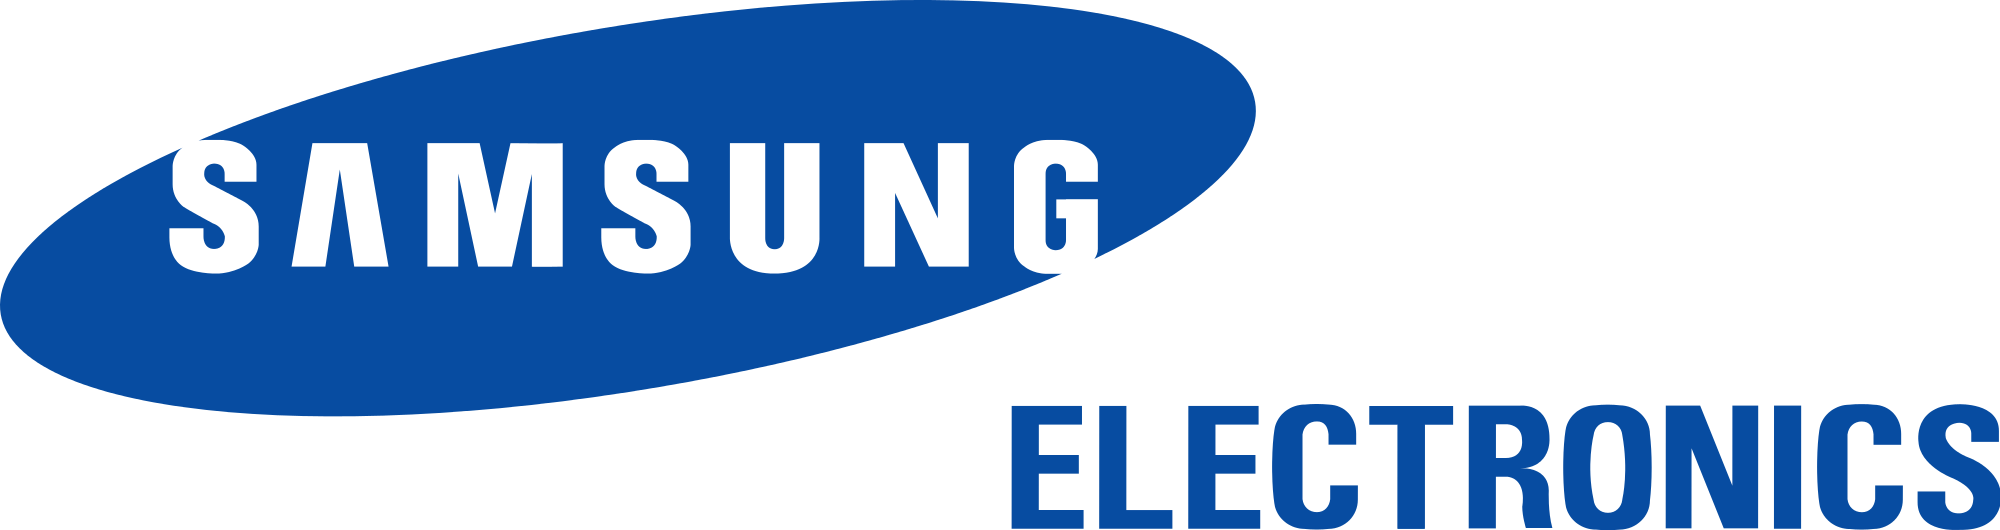 samsung electronics logo png